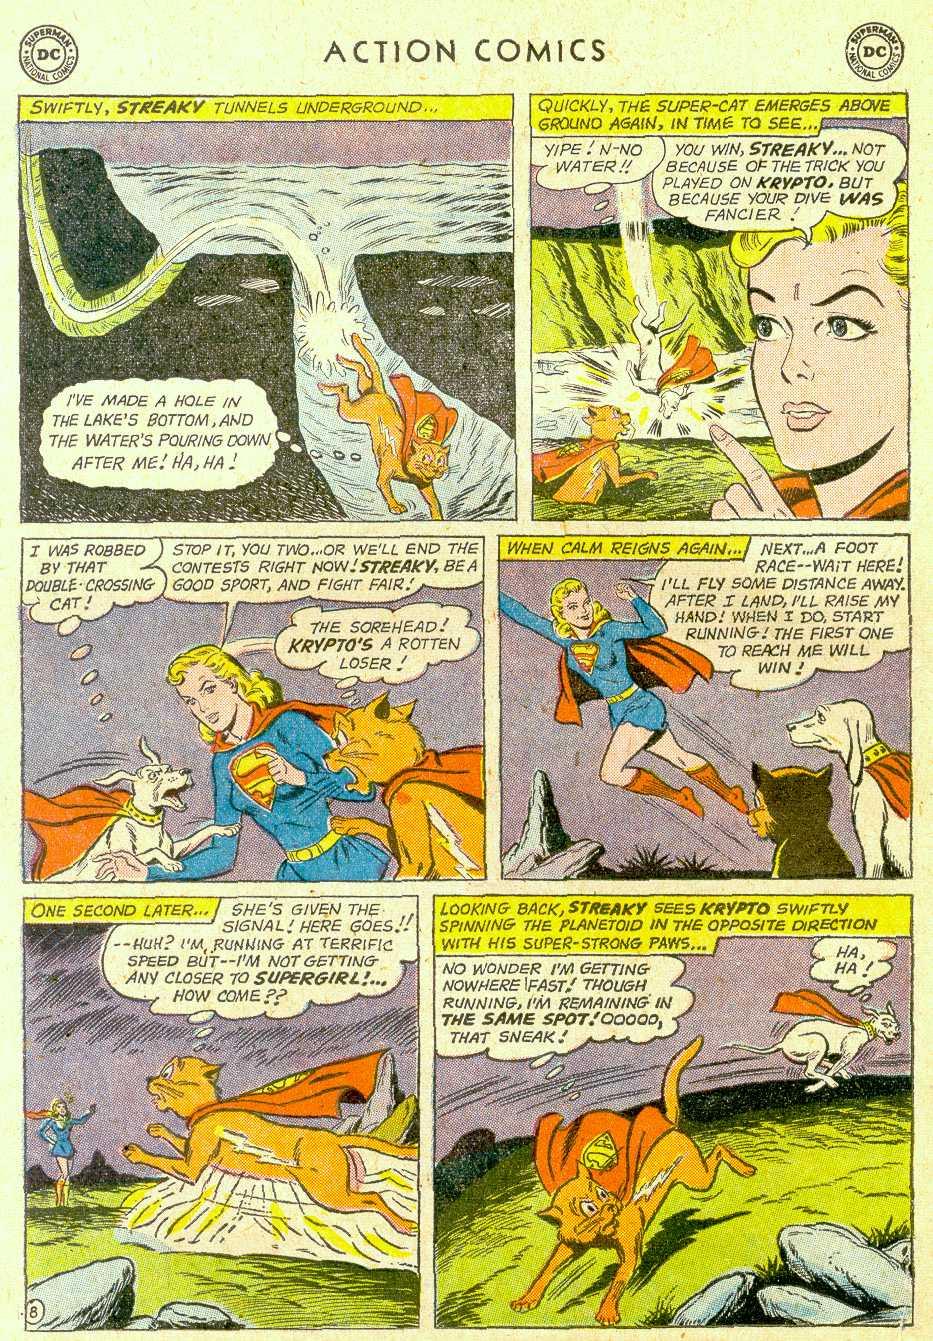 Action Comics (1938) 277 Page 25